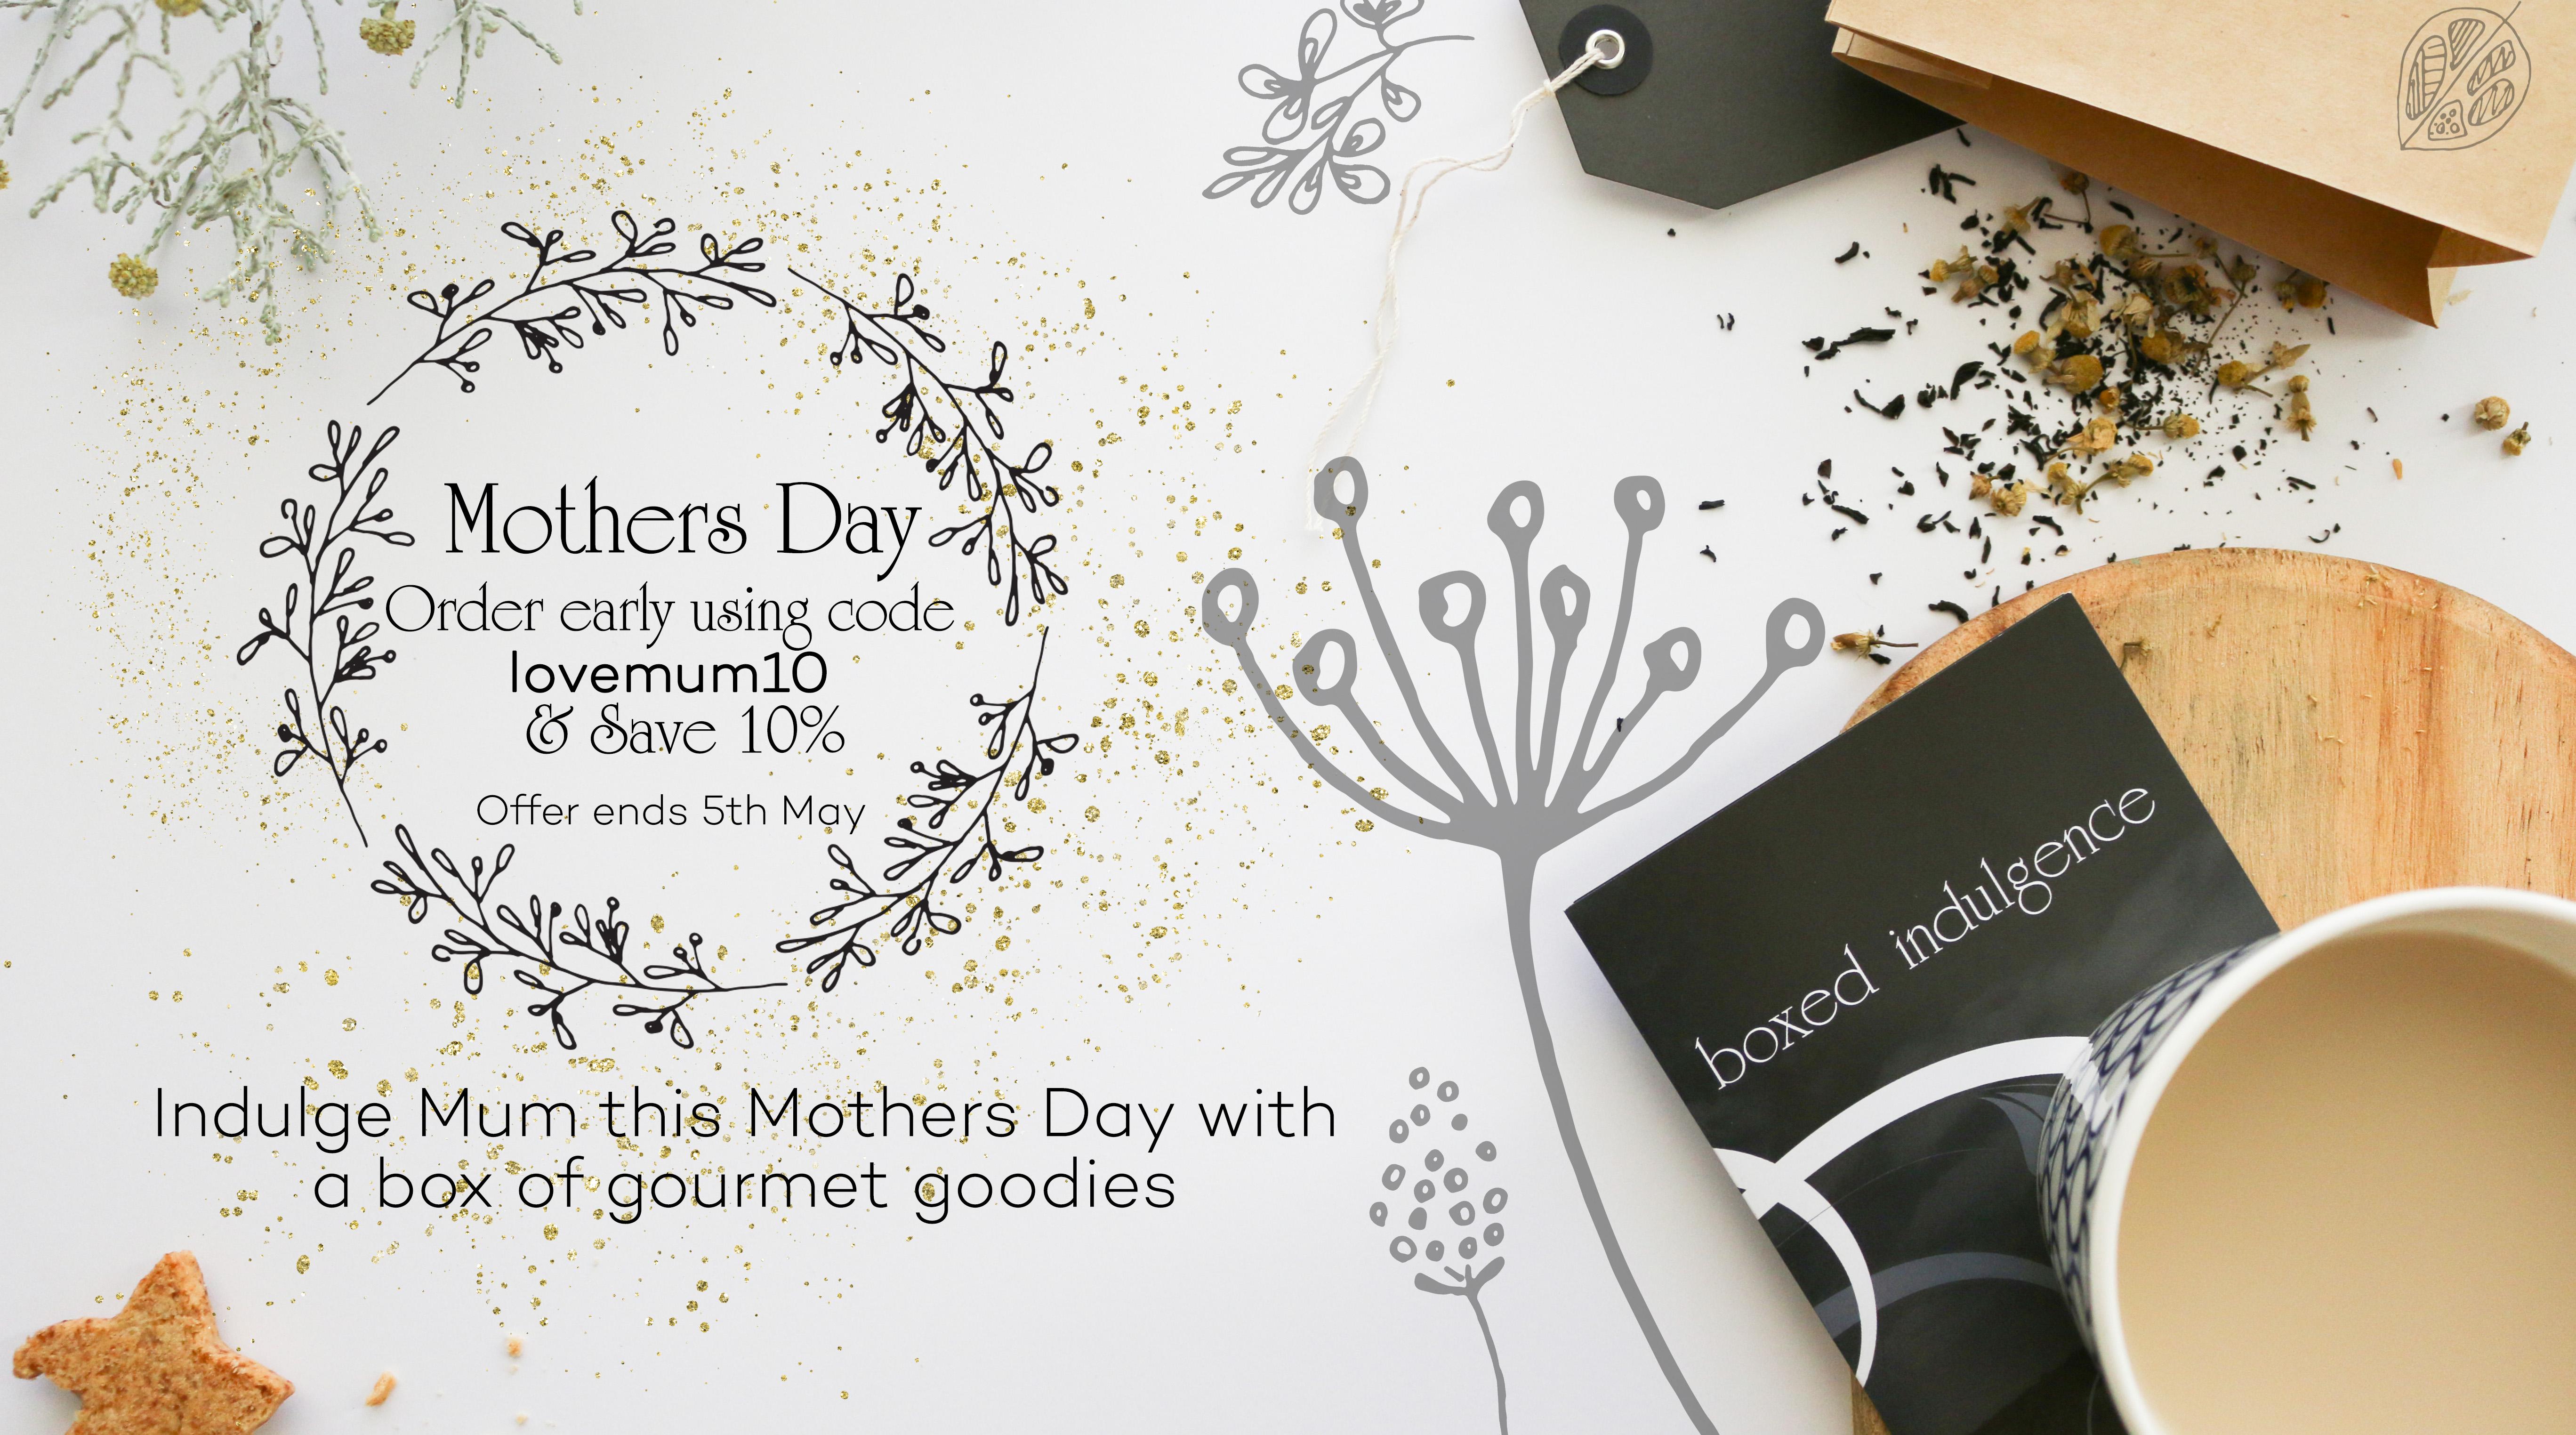 Mothers Day Promotion 2018 - Boxed Indulgence